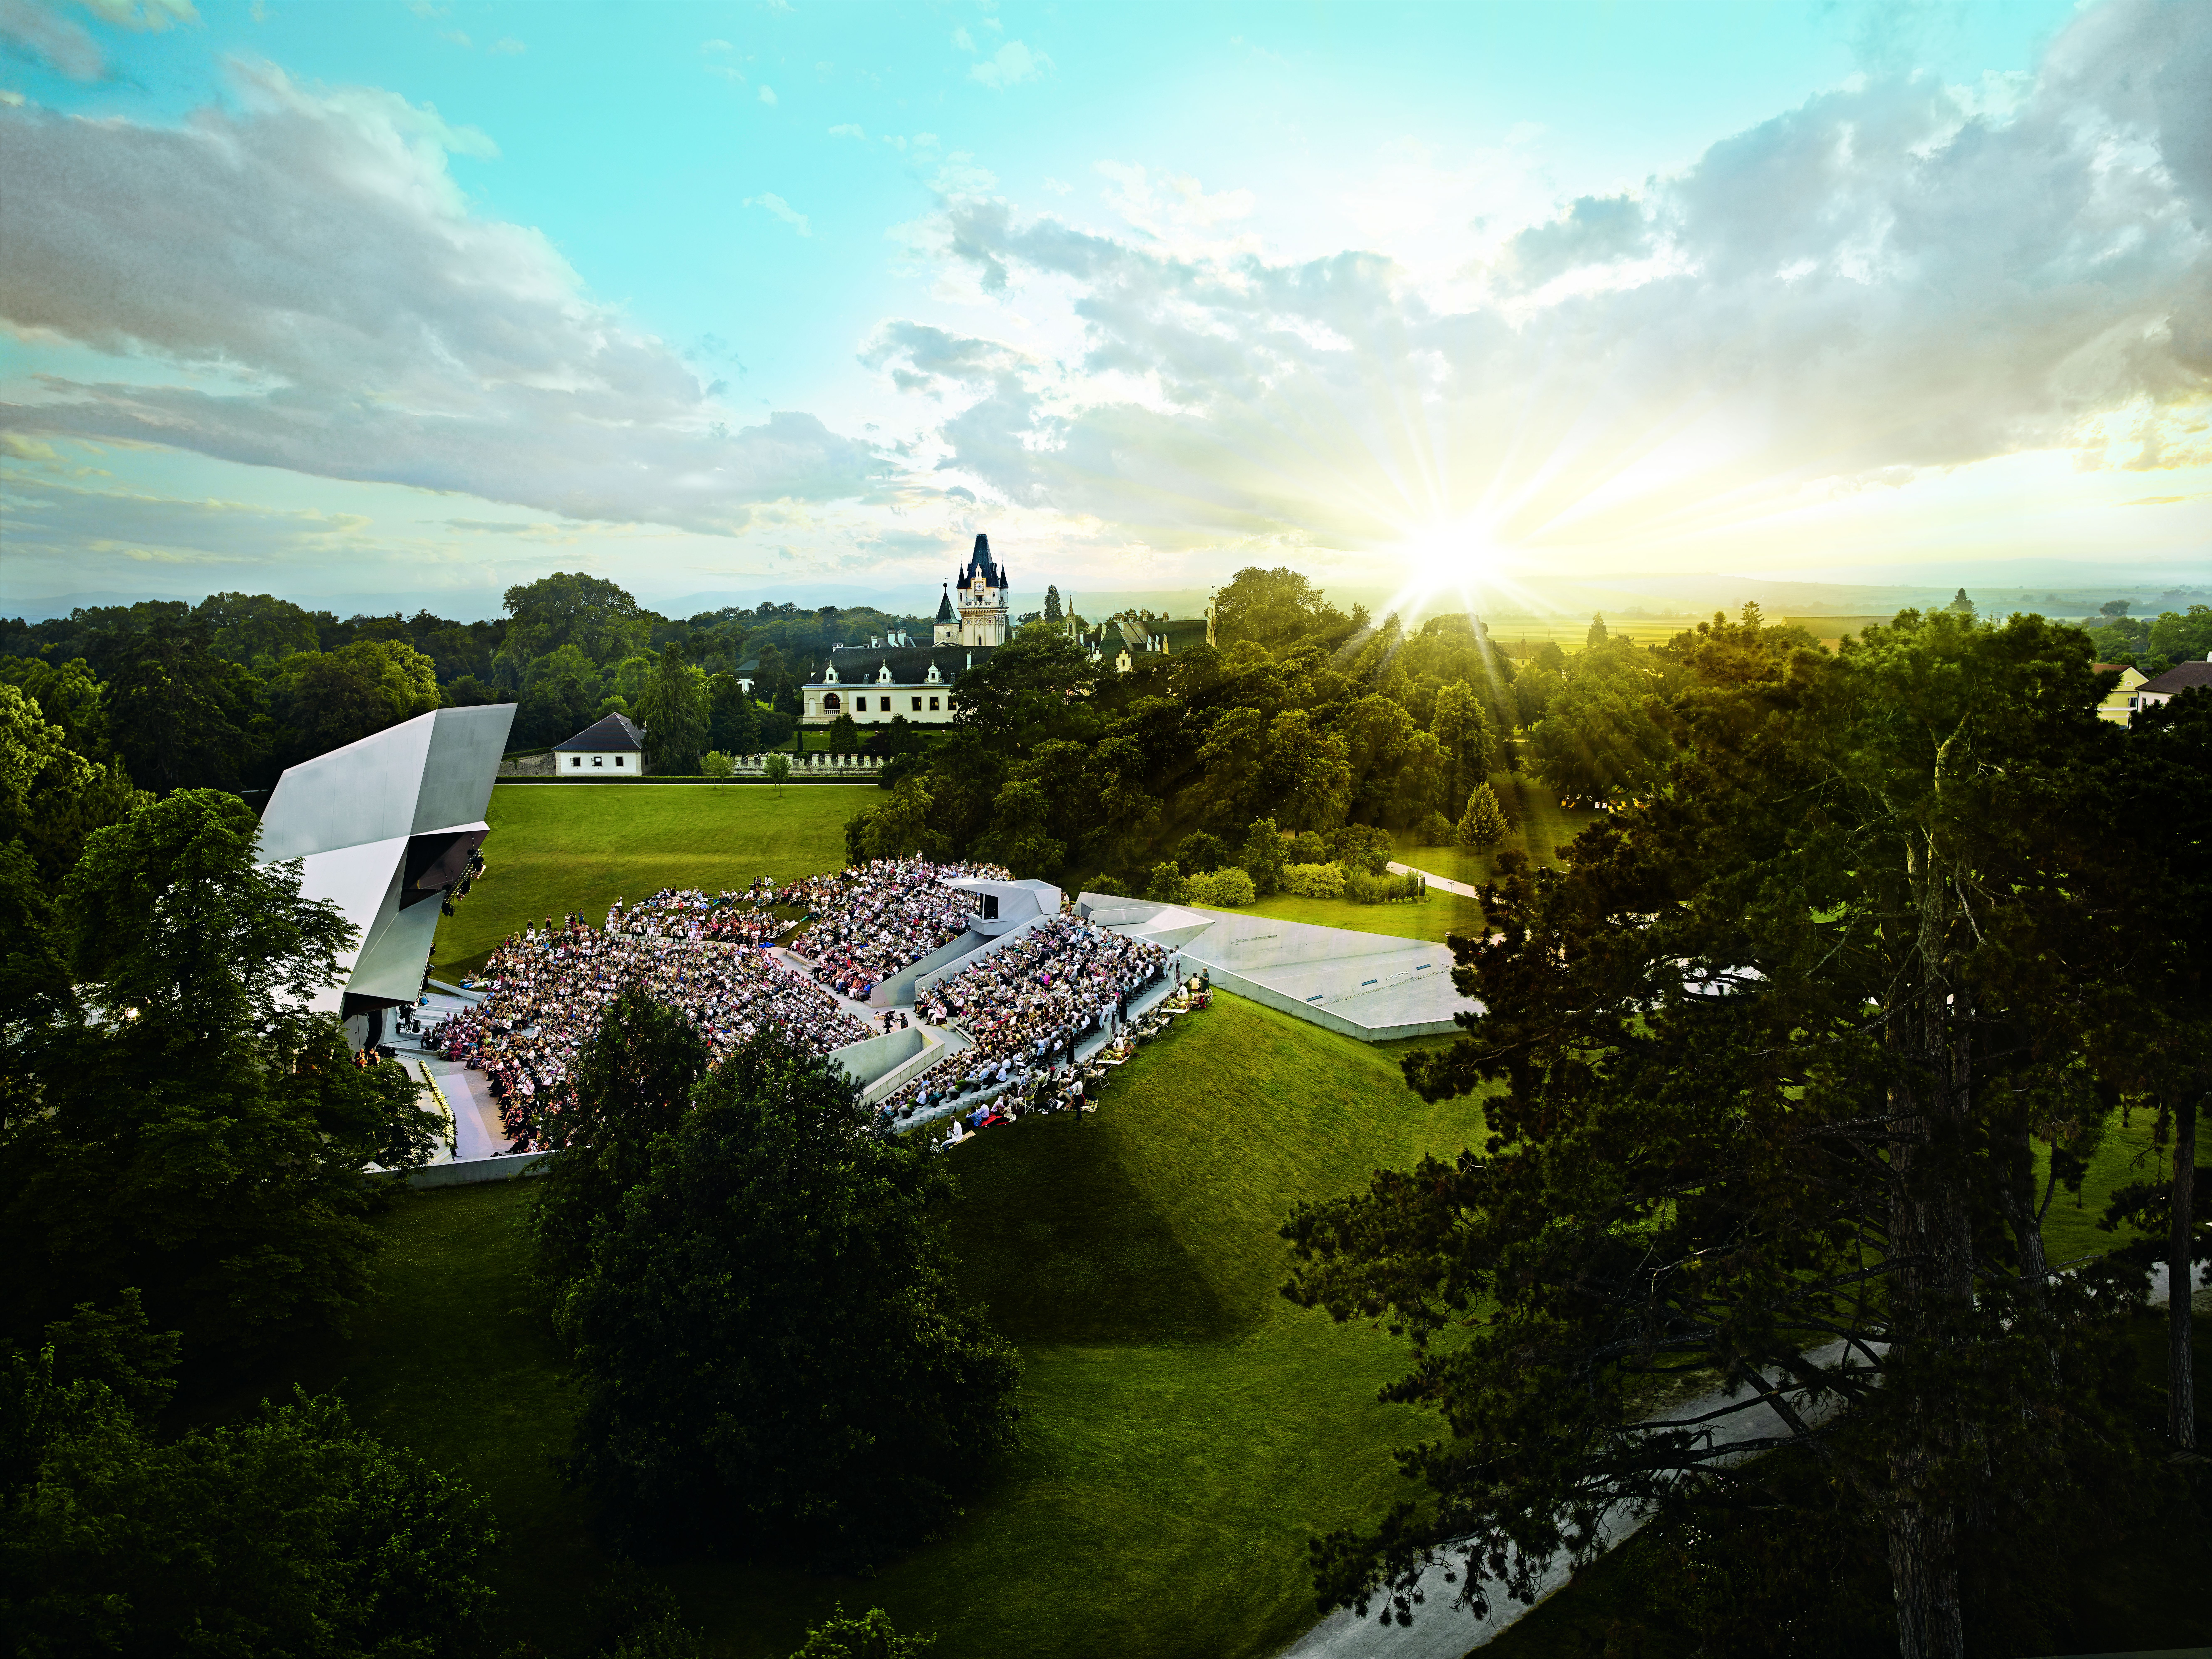 Grafenegg Festival stage and park with Grafenegg Castle in background - Grafenegg, Austria